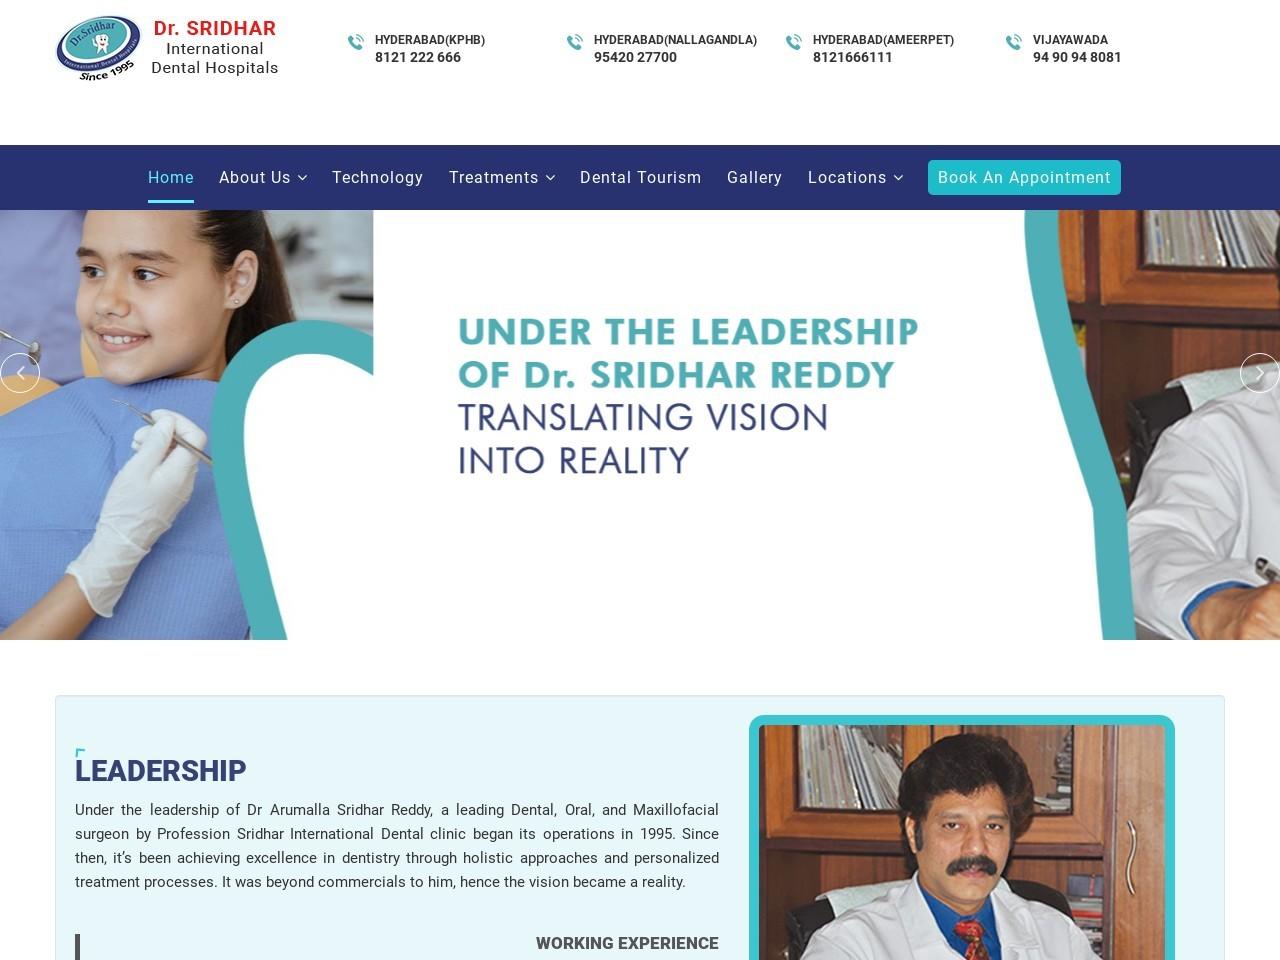 Dental Clinic in Ameerpet   Dentists in Ameerpet –  Dr.Sridhar International